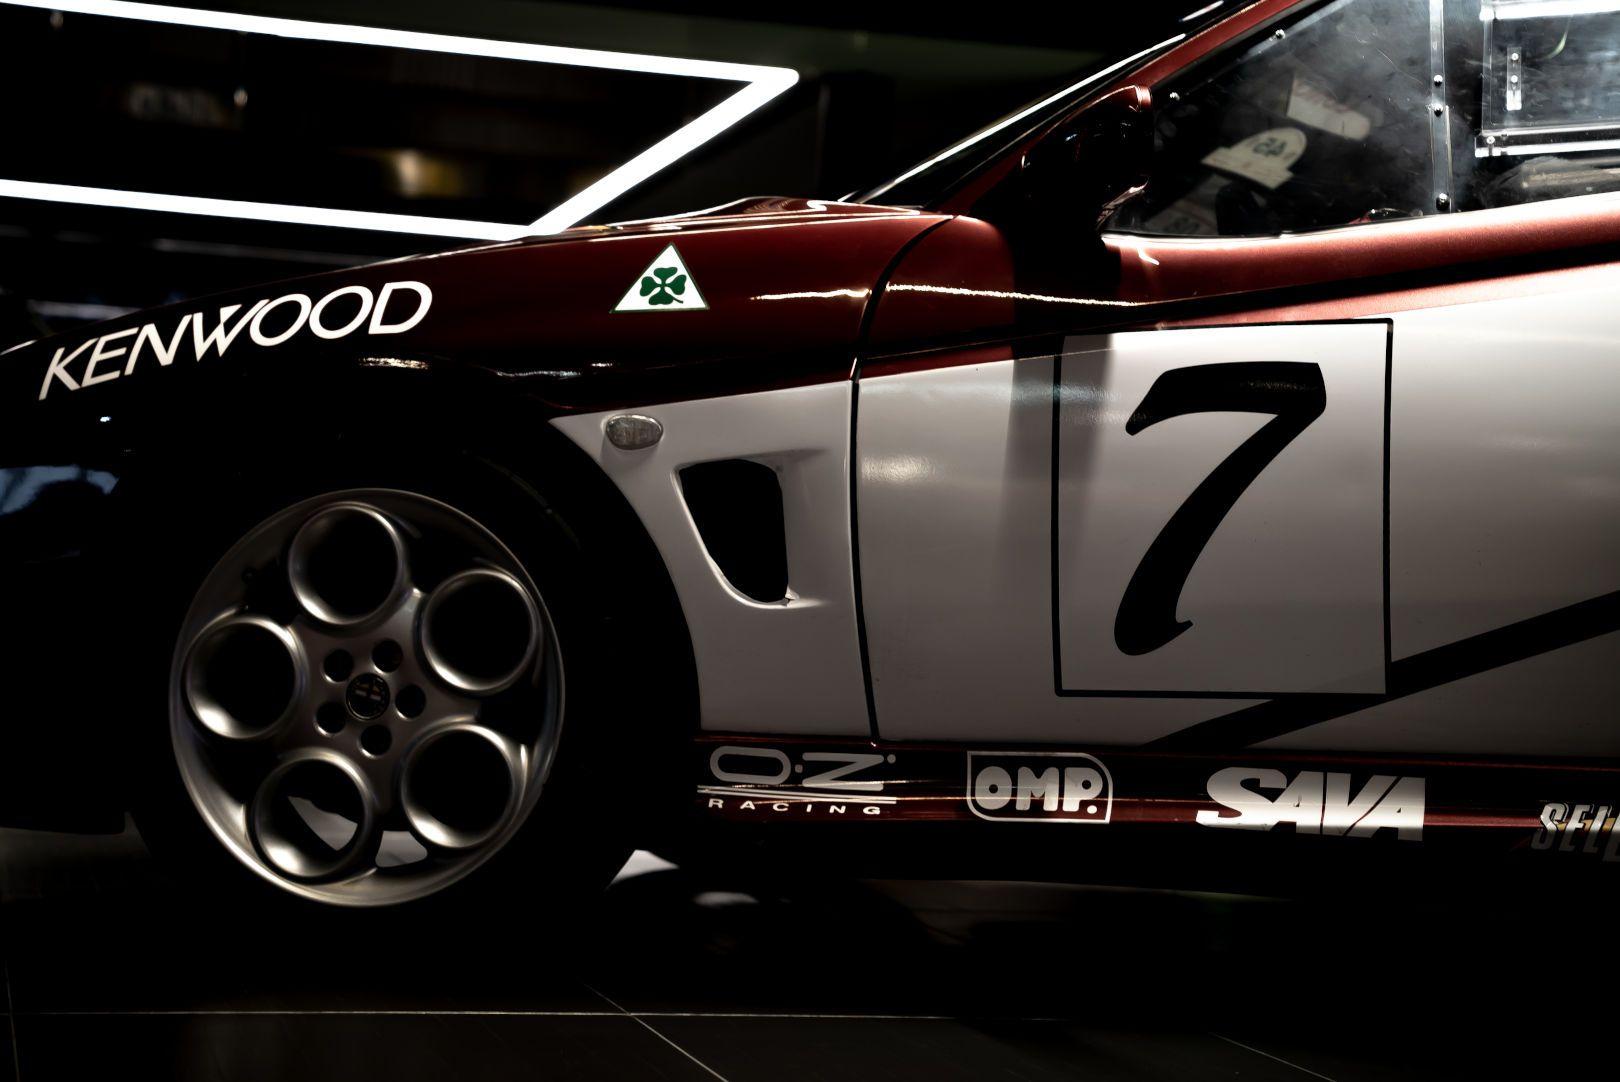 1995 Alfa Romeo GTV 2.0 V6 Turbo Cup Replica 57185